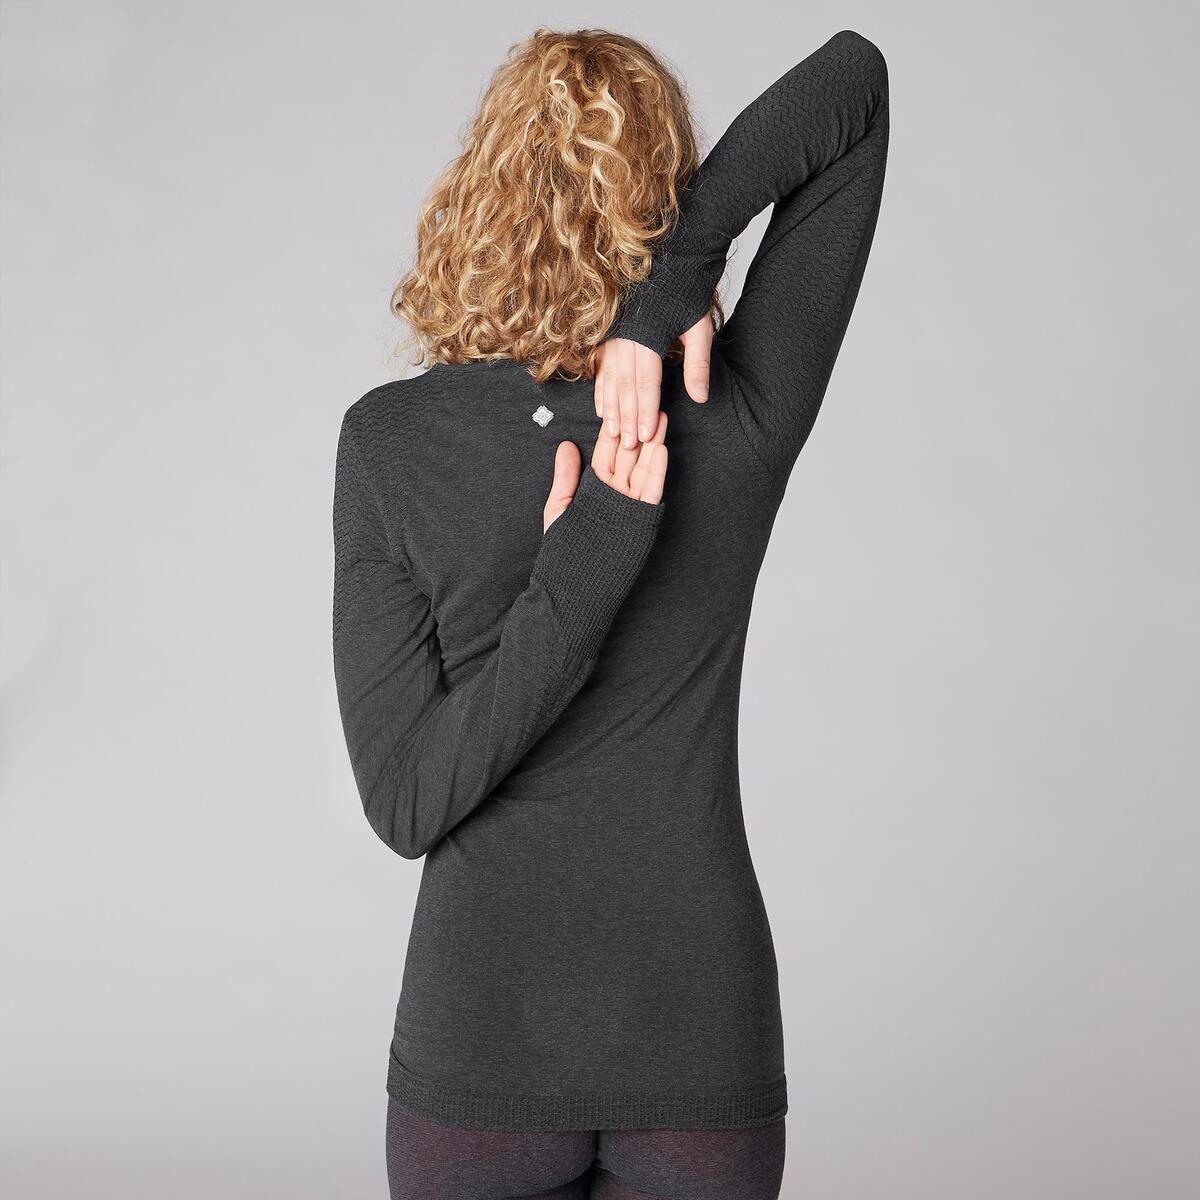 Bild 4 von Langarmshirt Yoga Damen dunkelgrau